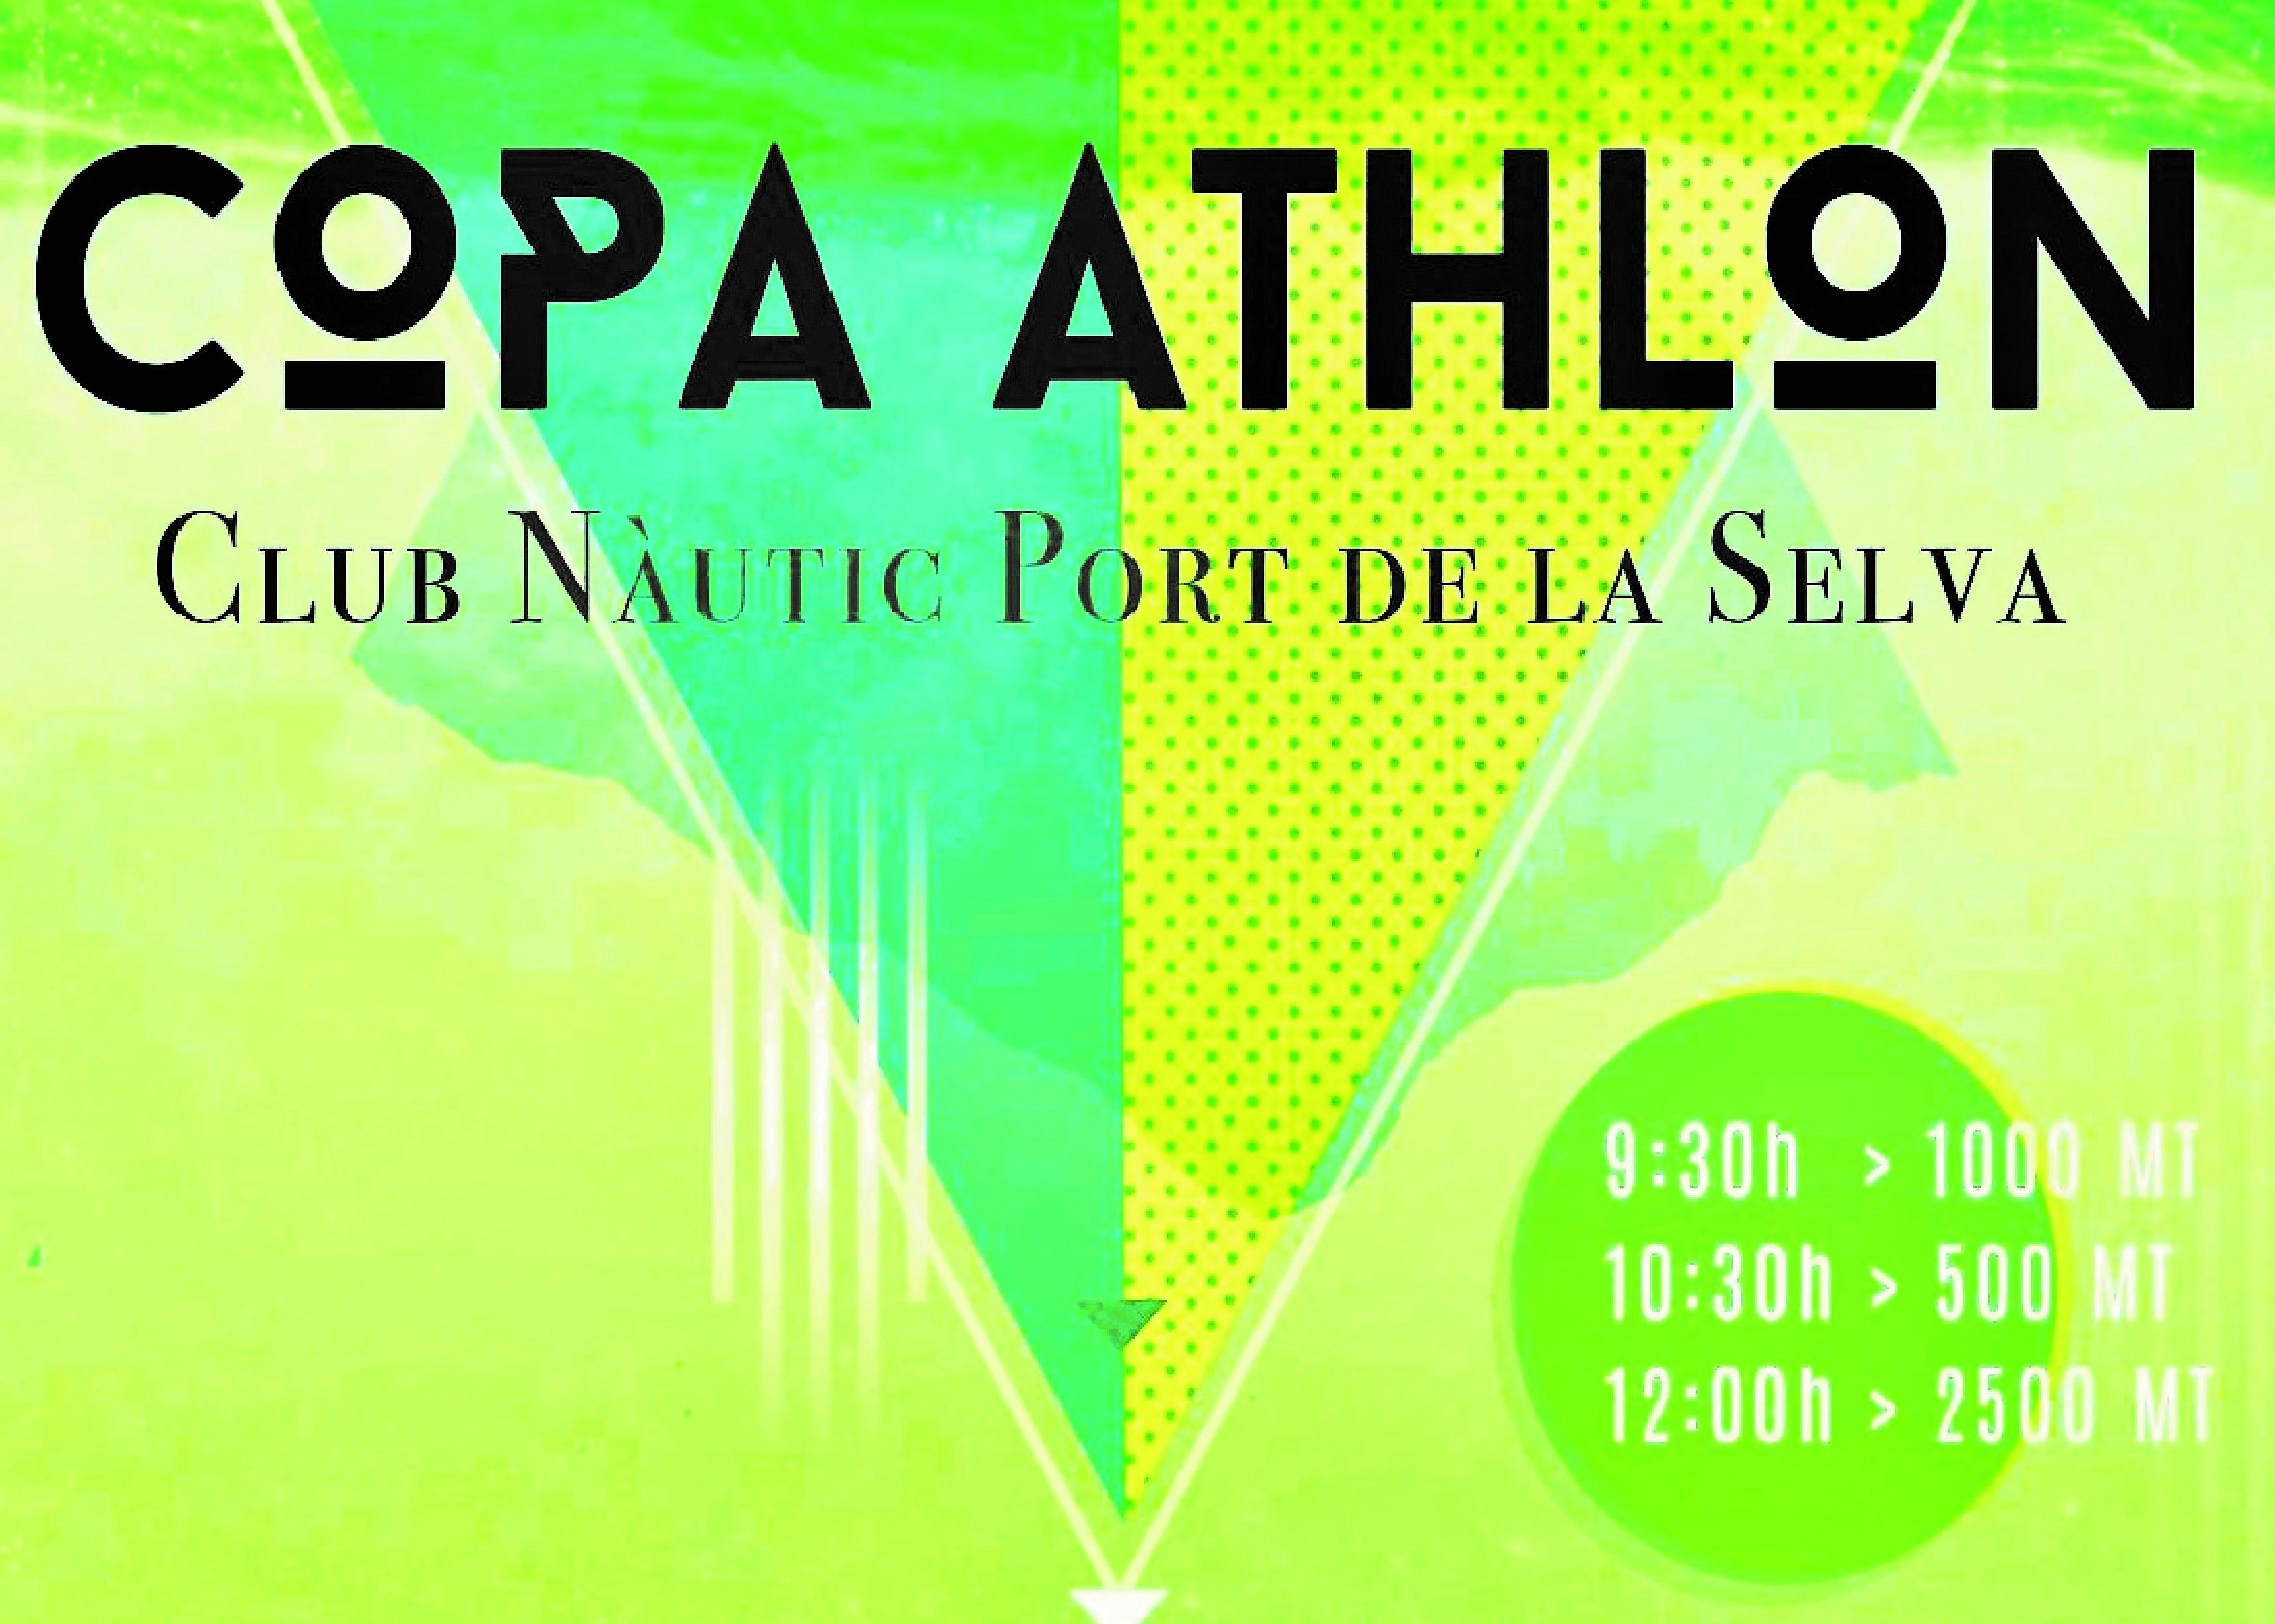 CNPS-Copa Athlon-cartell2